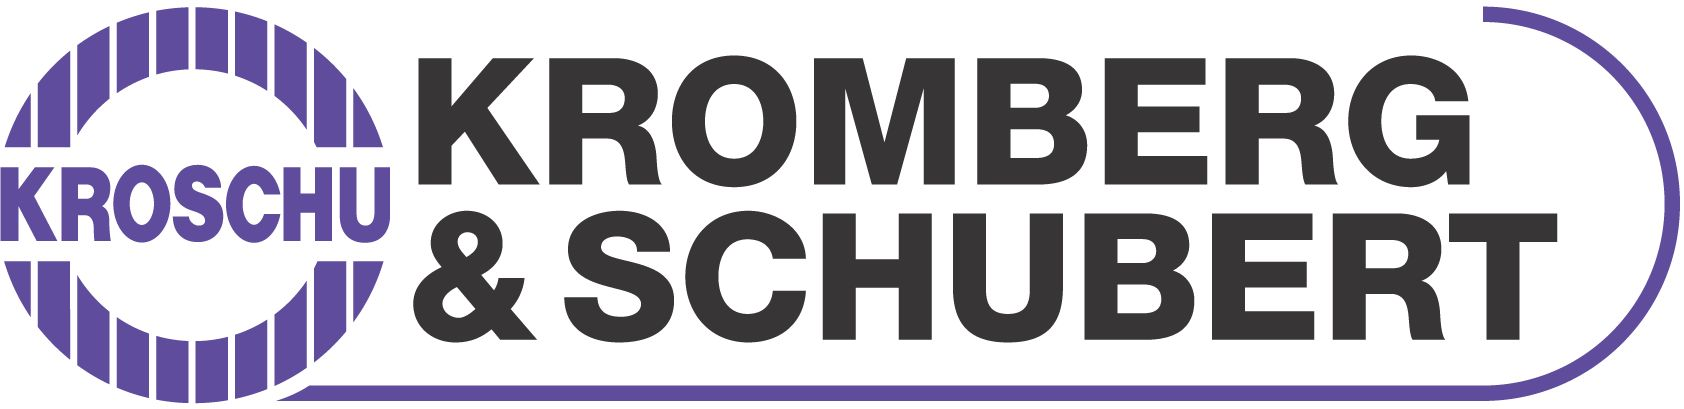 Kromberg & Schubert Srbija d.o.o. Kruševac